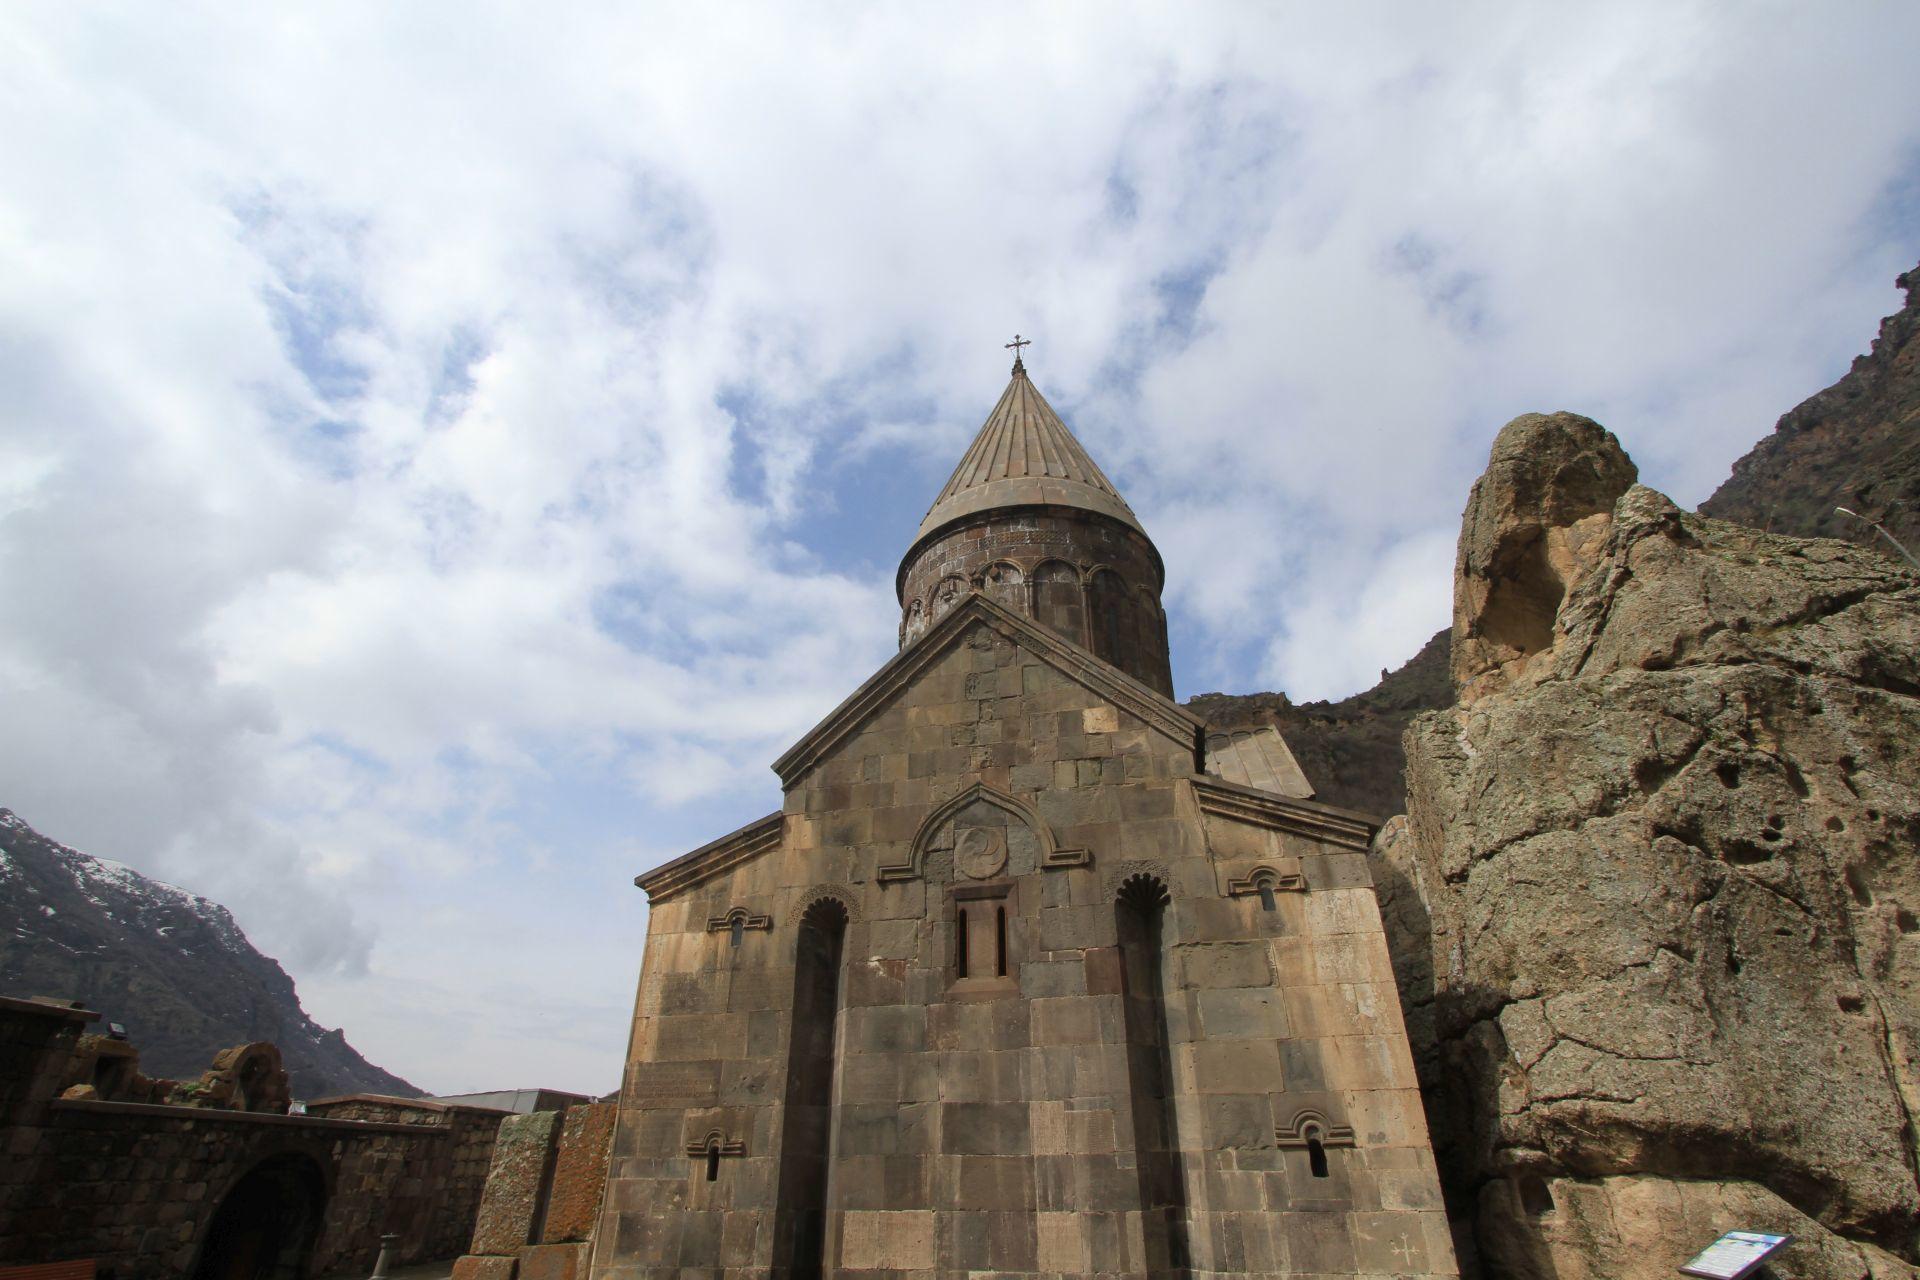 Armenia Road Trip Part 2 - Geghard and Garni, A Monastery and a Temple